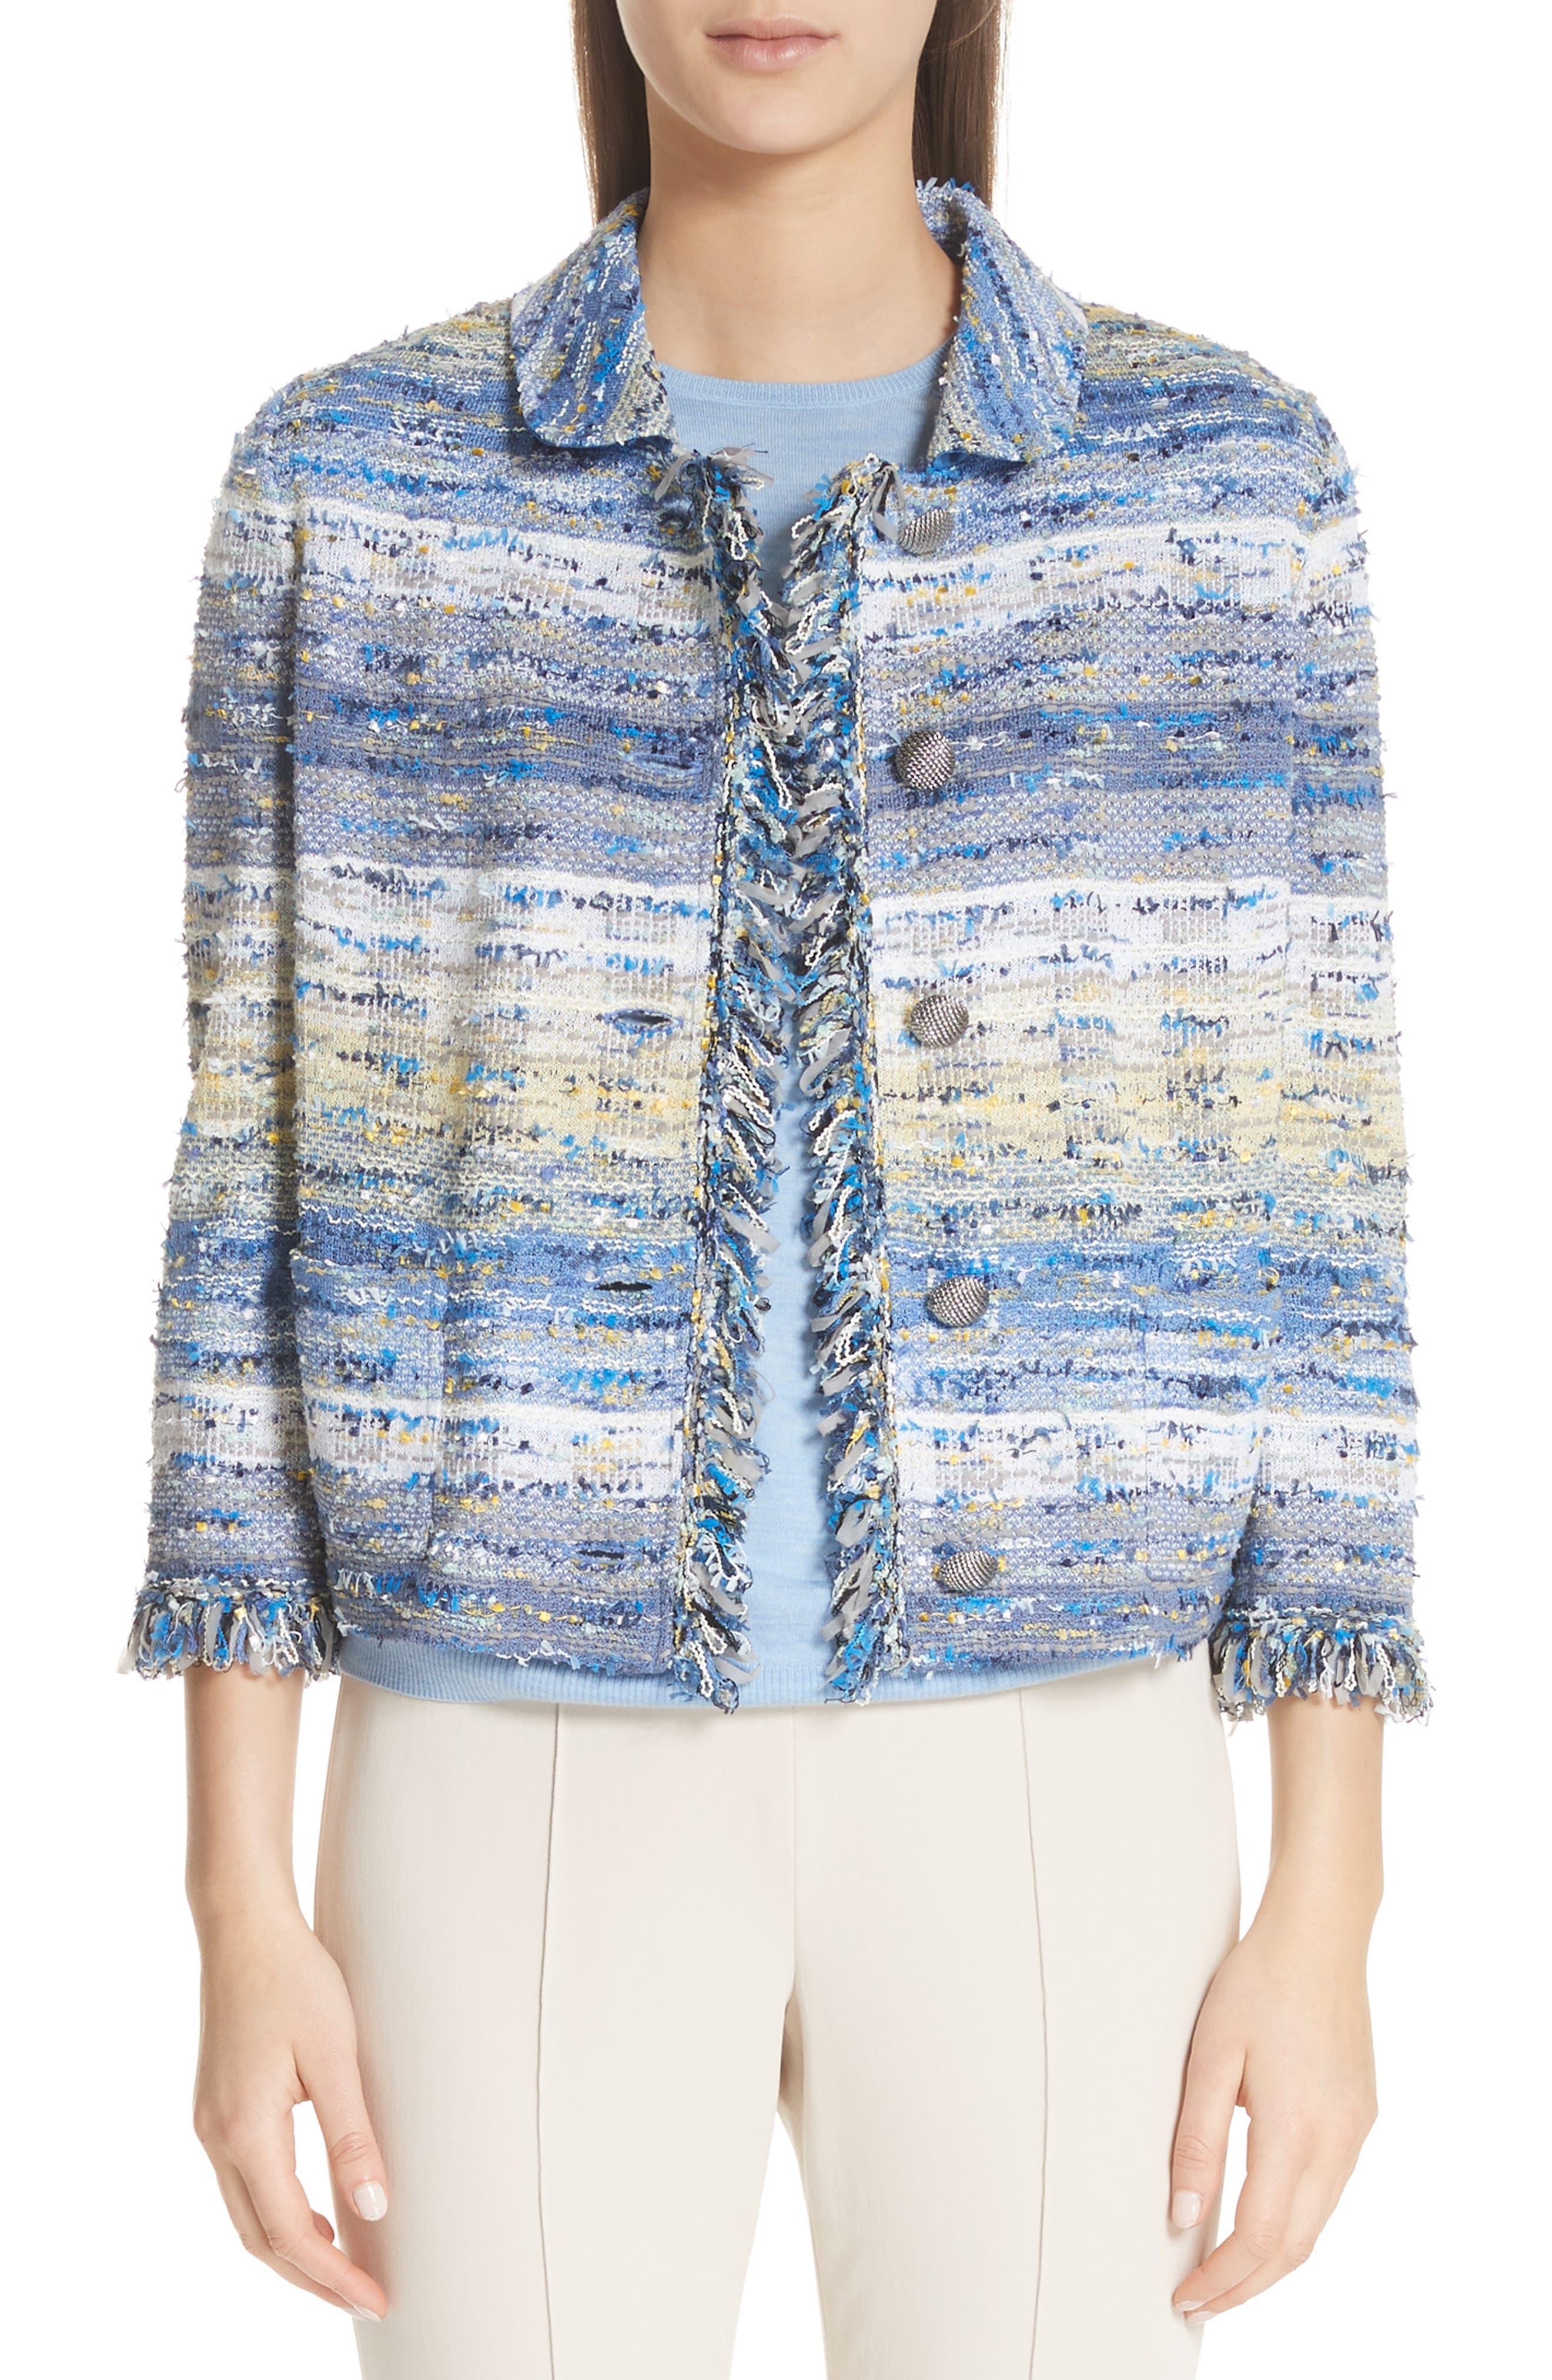 ST. JOHN Chelsea 3/4-Sleeve Tweed Knit Jacket in Blue